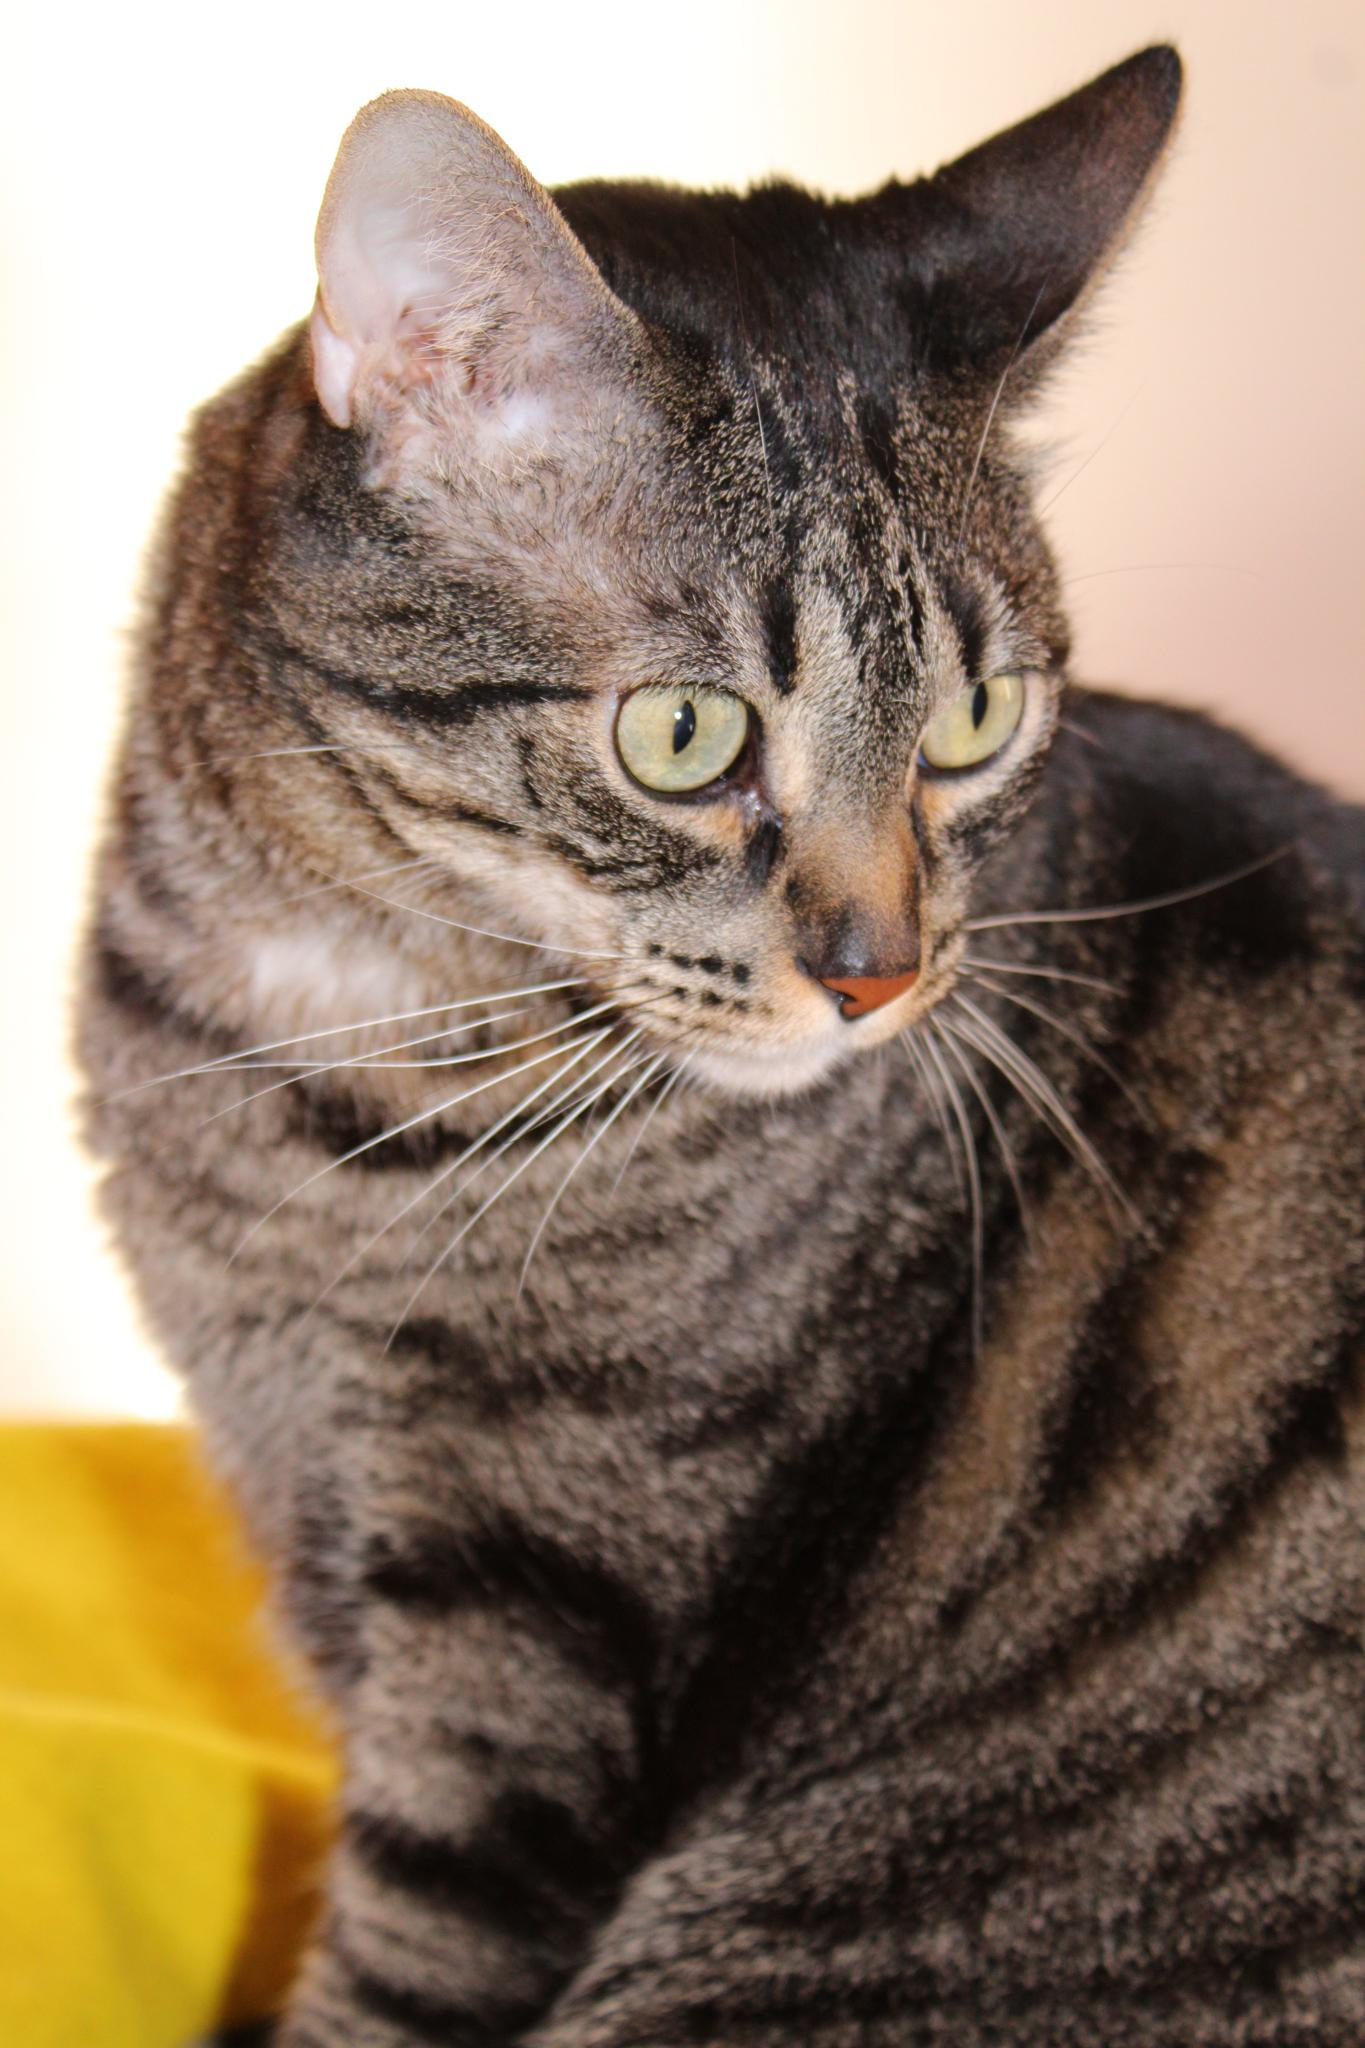 Cat by Cristina R